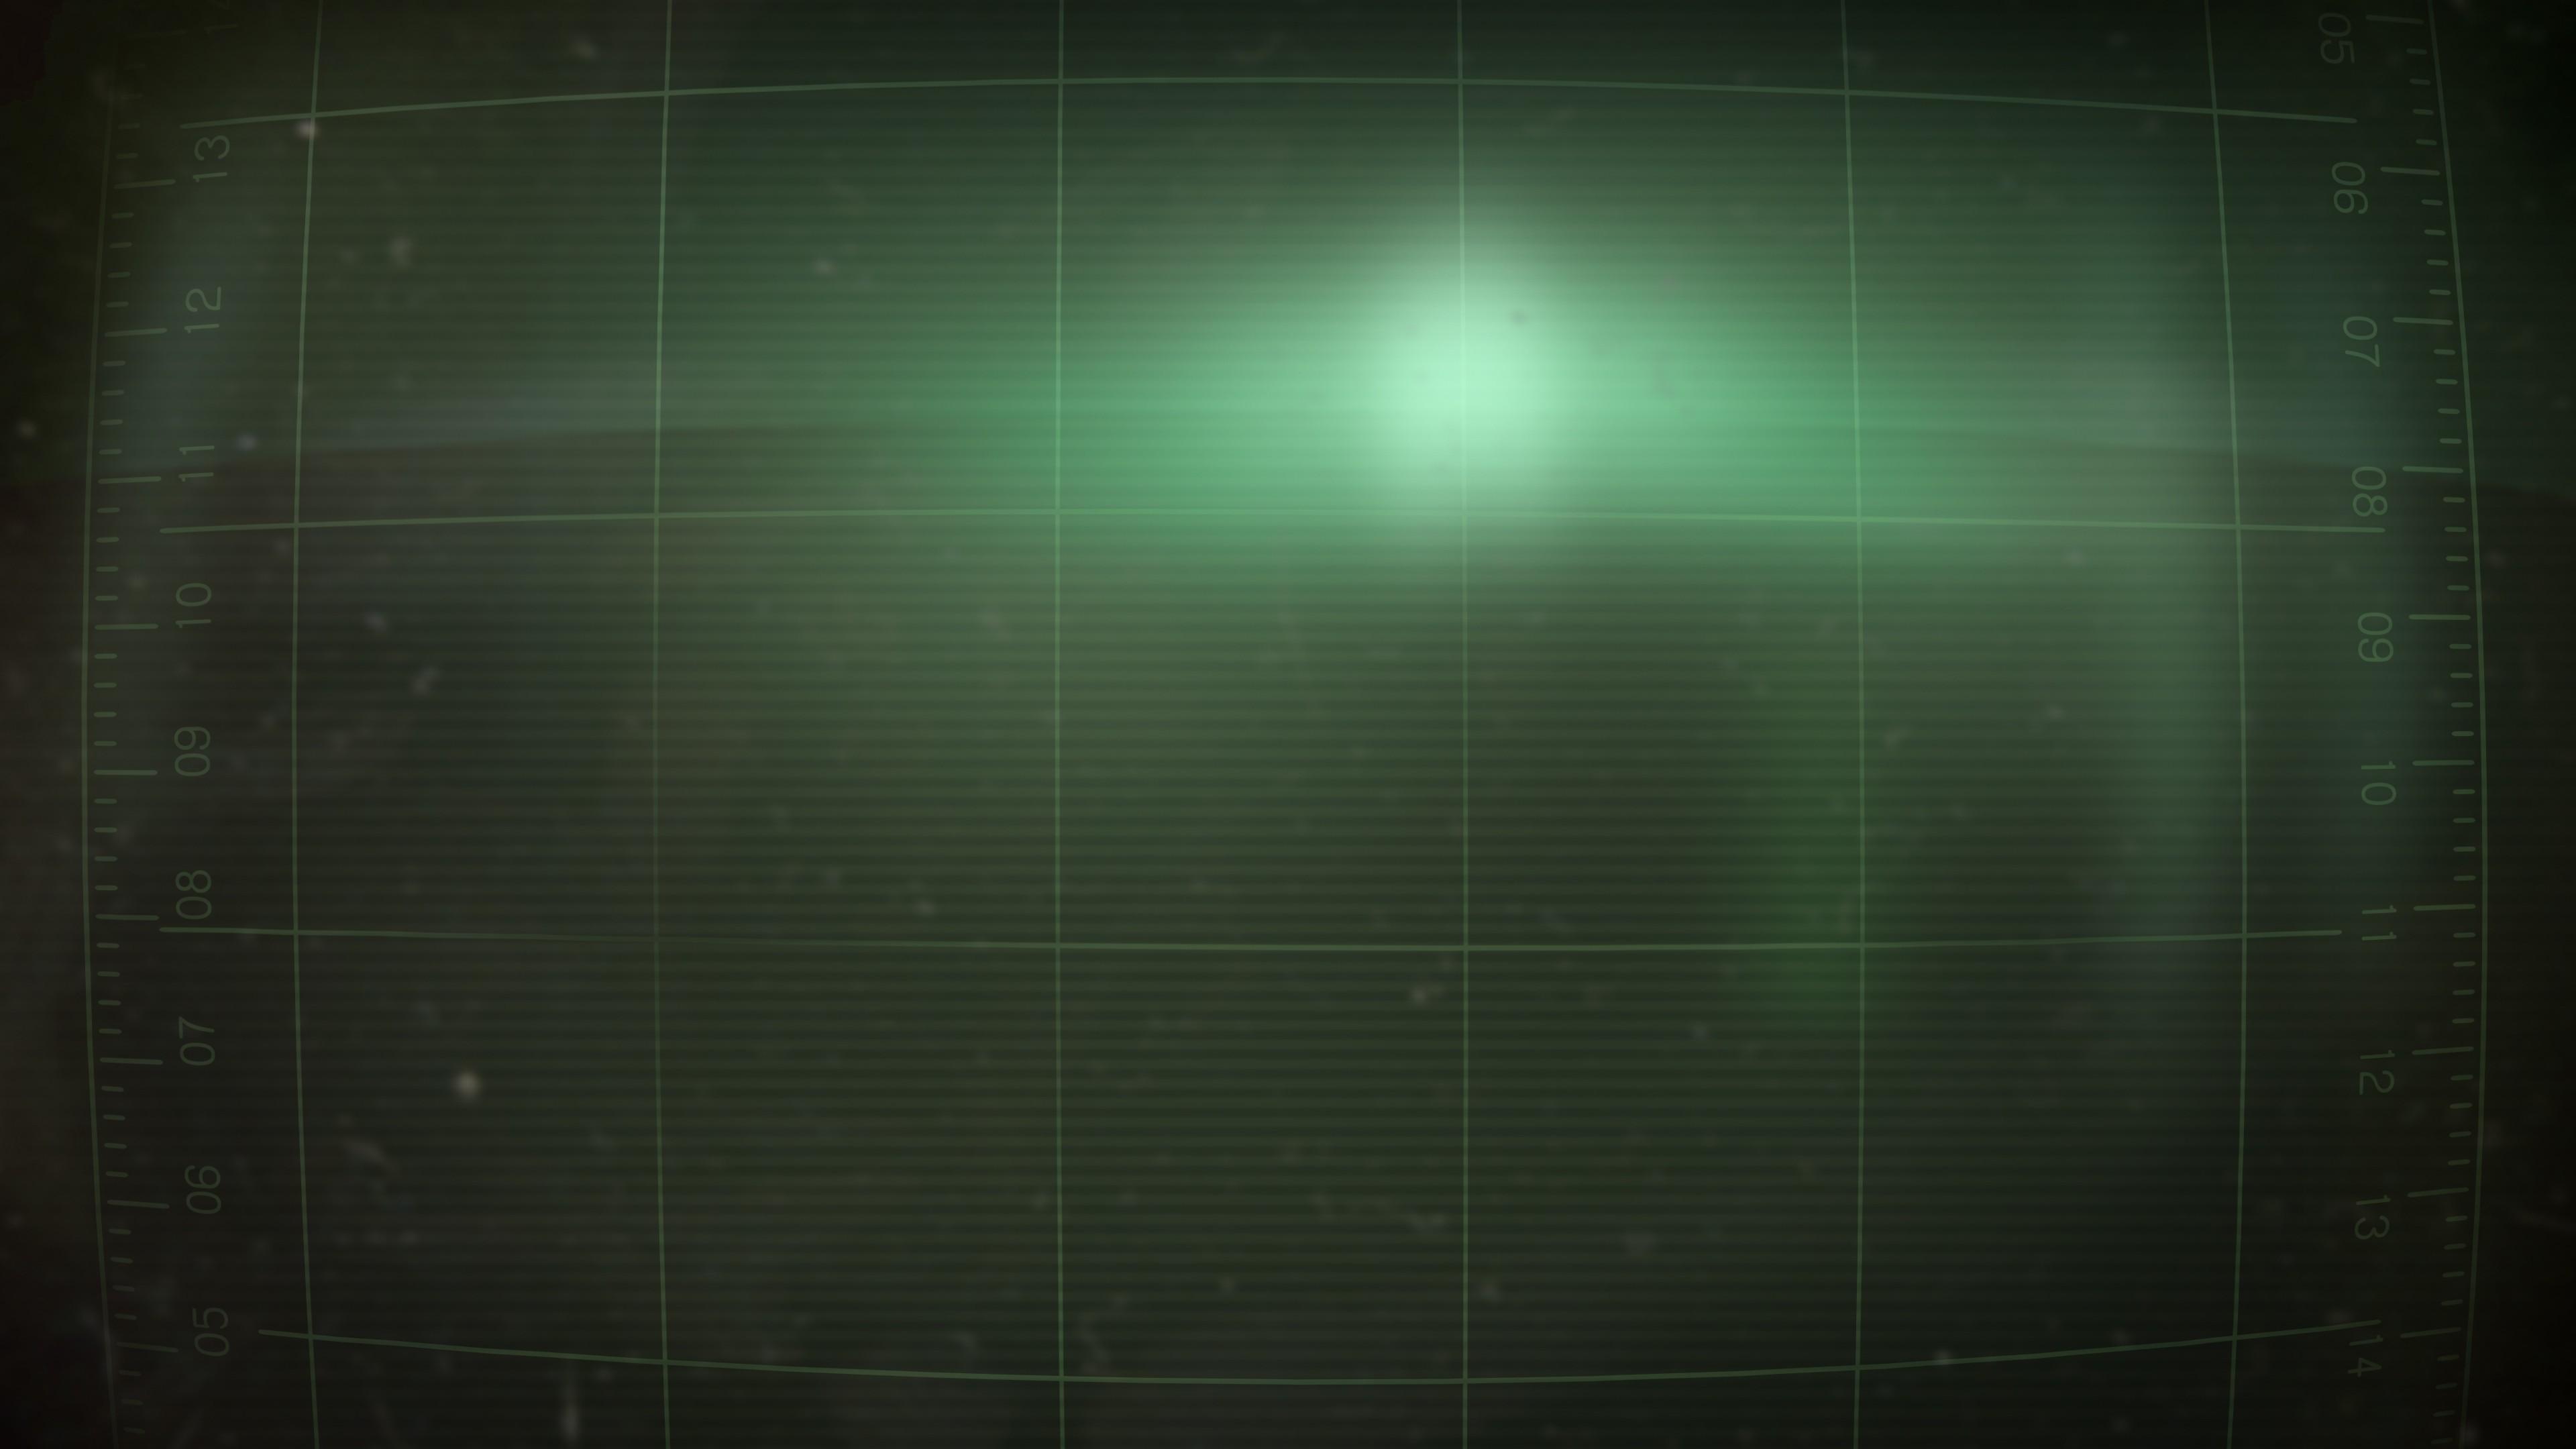 Fallout Pip Boy (65 Wallpapers) – HD Wallpapers for Desktop